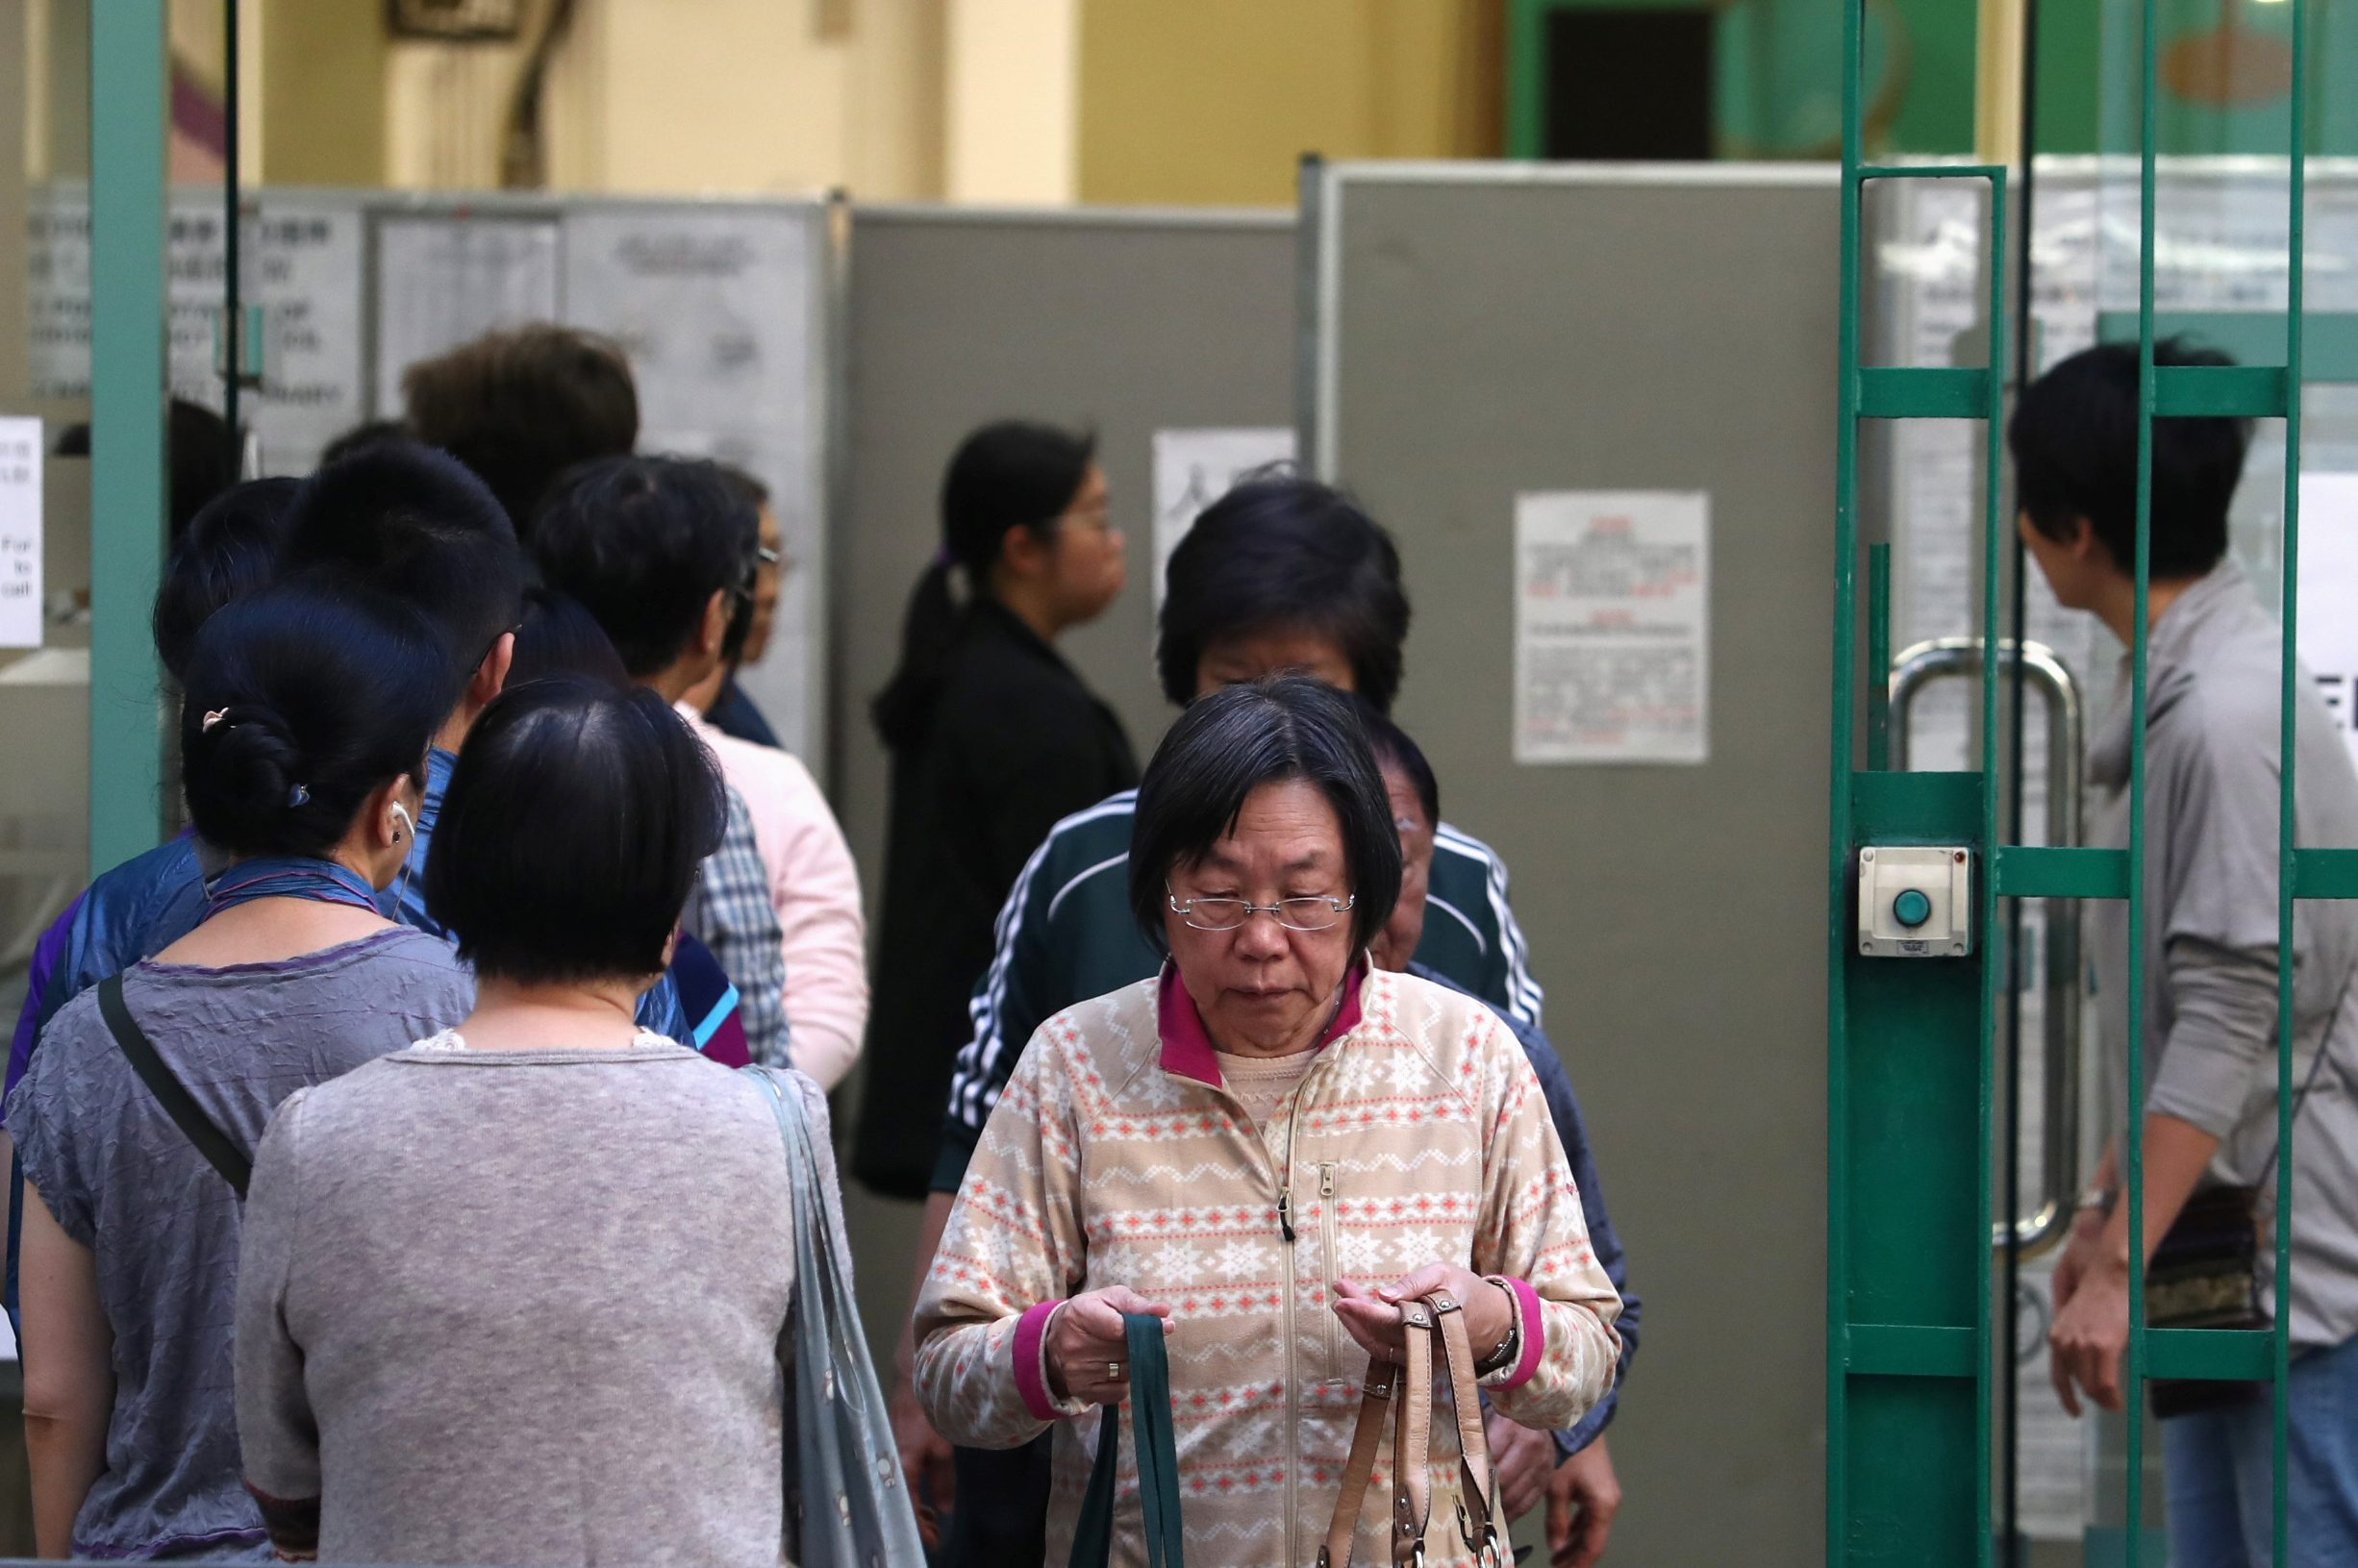 2019-11-23T234847Z_1402799584_RC2BHD980QWE_RTRMADP_3_HONGKONG-PROTESTS-ELECTION